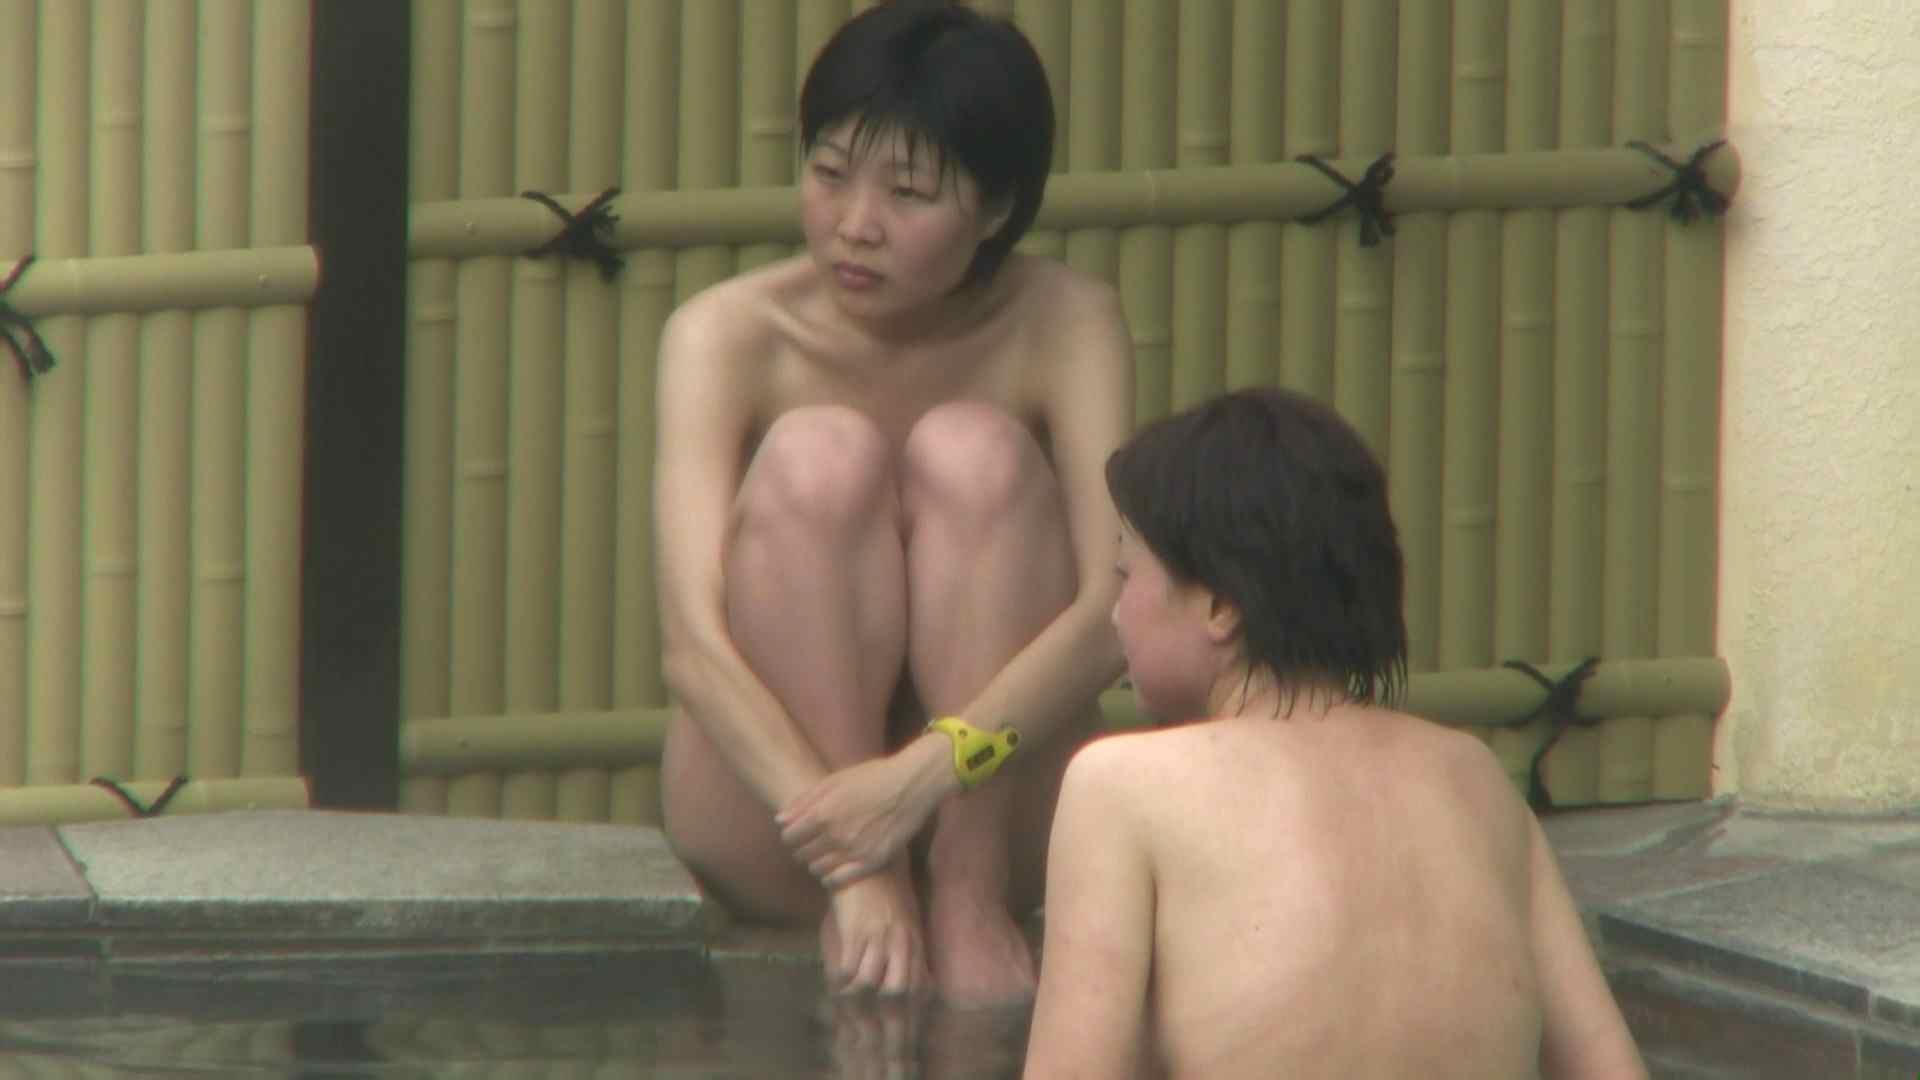 Aquaな露天風呂Vol.74【VIP限定】 露天風呂編  103PIX 68